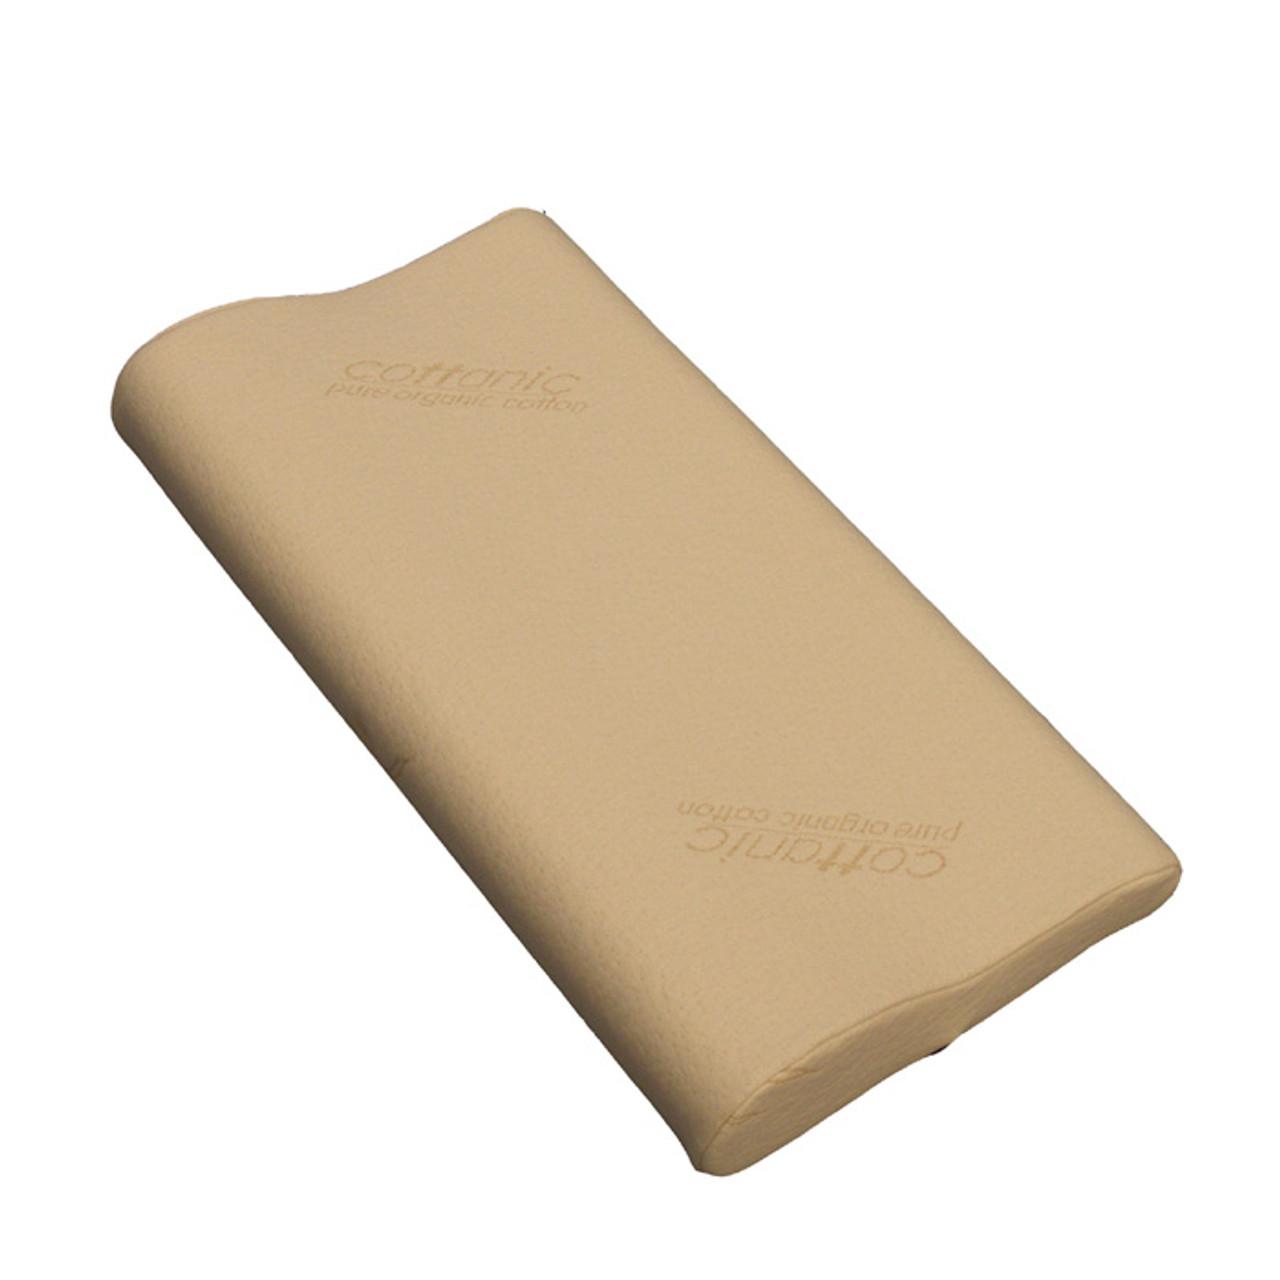 Strobel Supple Pedic Memory Foam Pillow | Ergonomic Contour Pillow